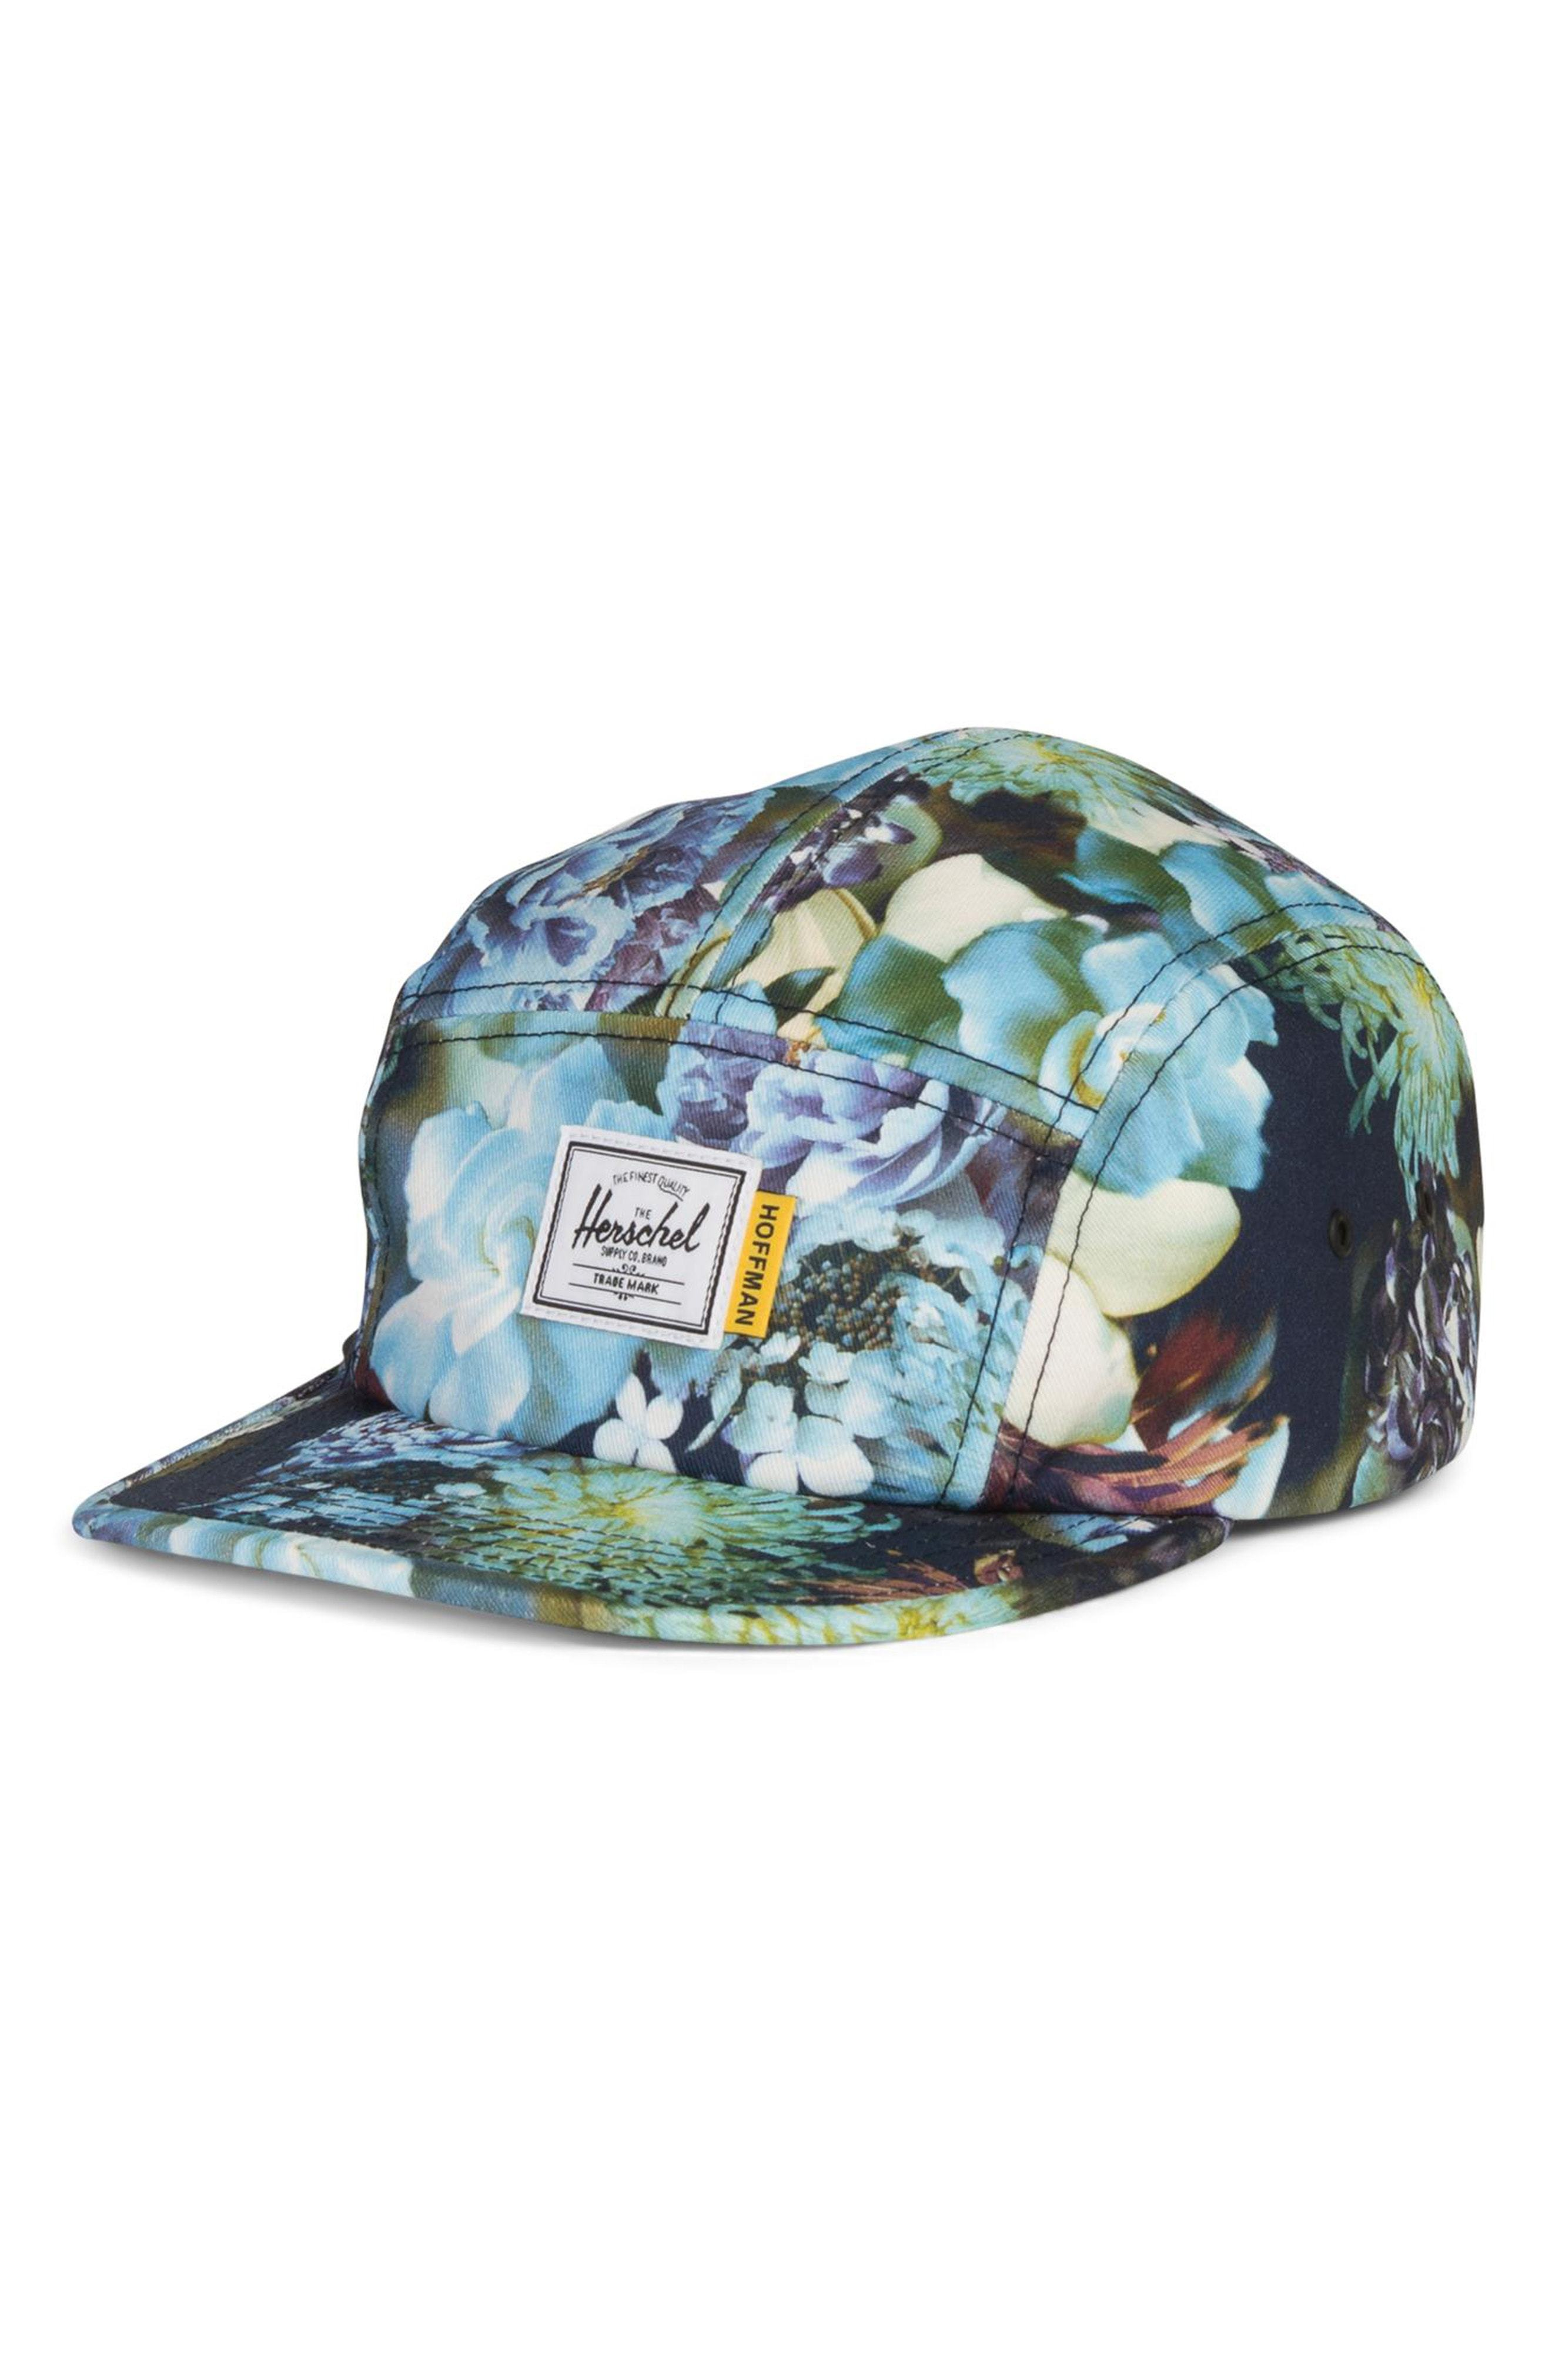 810481e6220 ... czech multi colored baseball caps herschel supply co. hoffman glendale  cap cfc6b 7c759